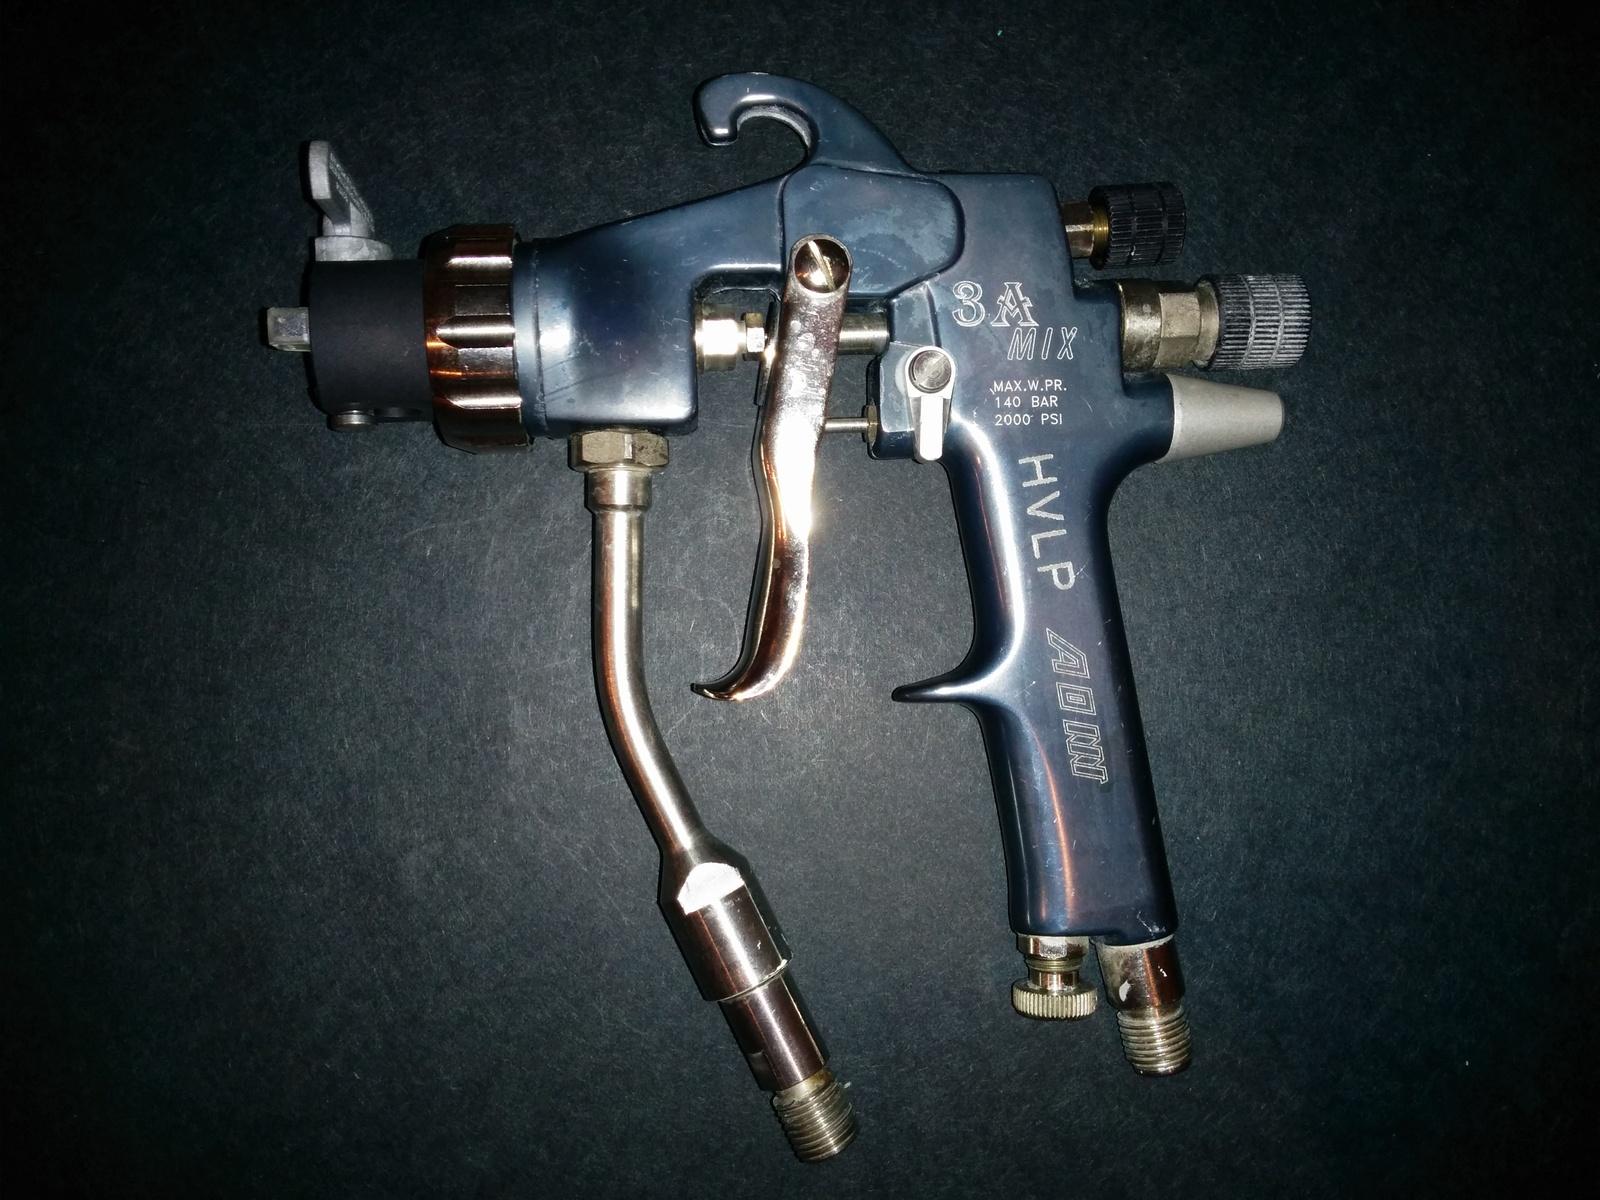 Airless Spraygun Manufacturers Mail: AOM Asturo K1 3A MIX Air Assisted Airless Spray Gun 25506